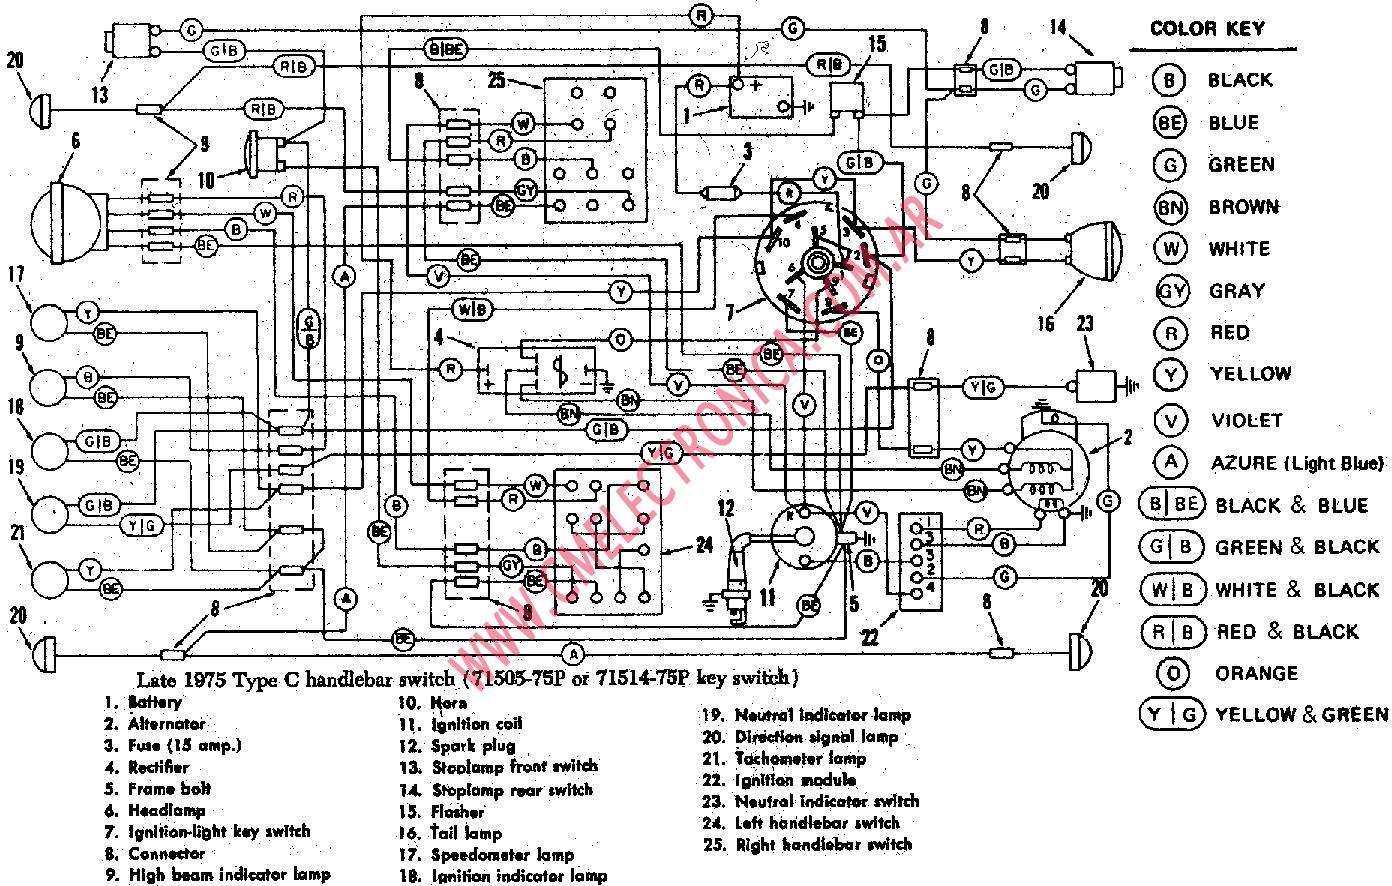 1991 harley davidson fxr wiring diagram